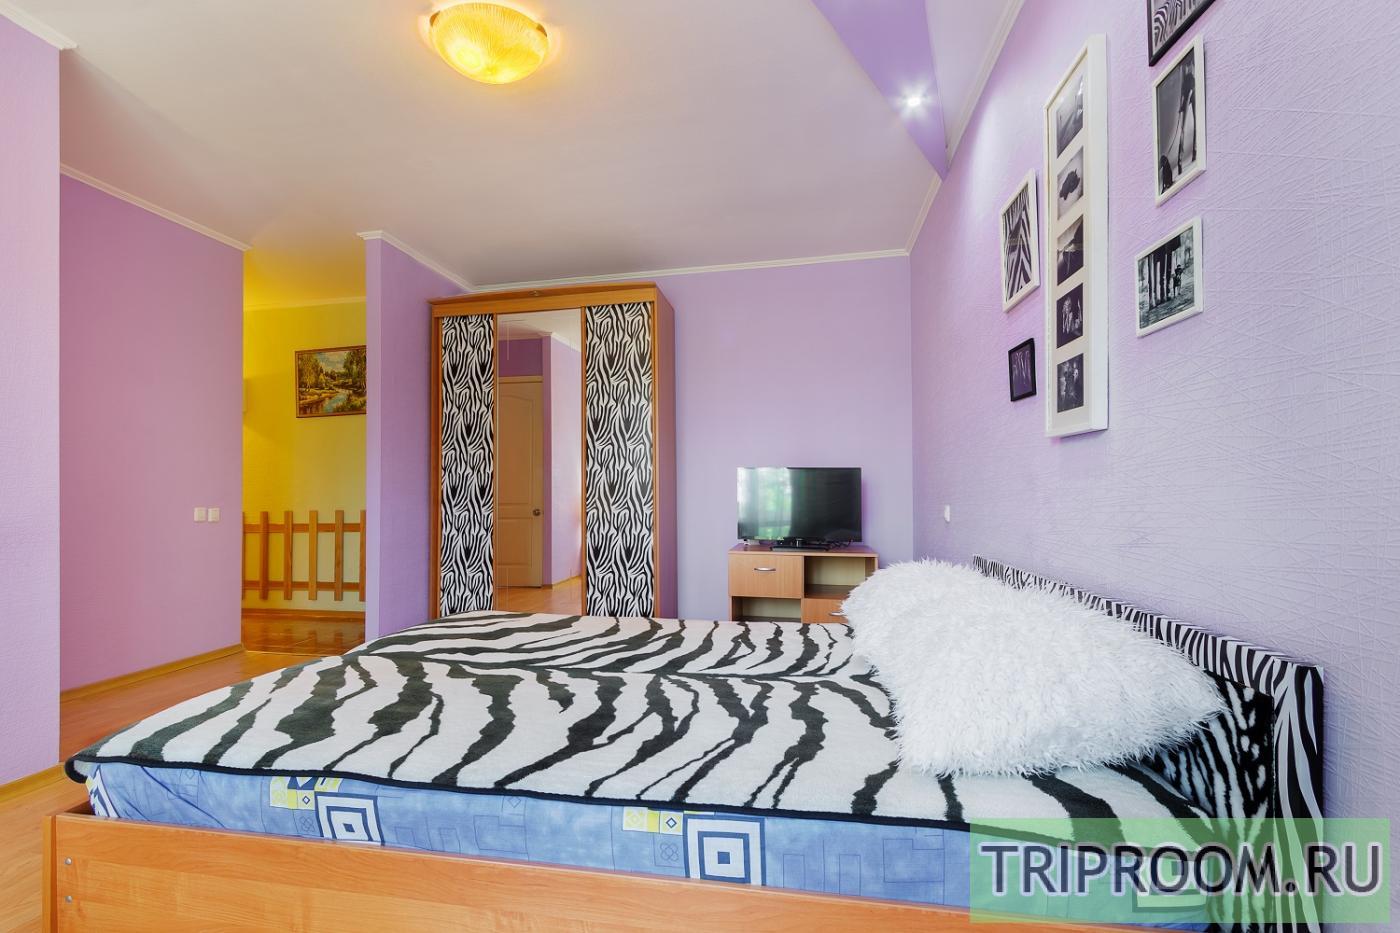 1-комнатная квартира посуточно (вариант № 11529), ул. Максима Горького улица, фото № 3